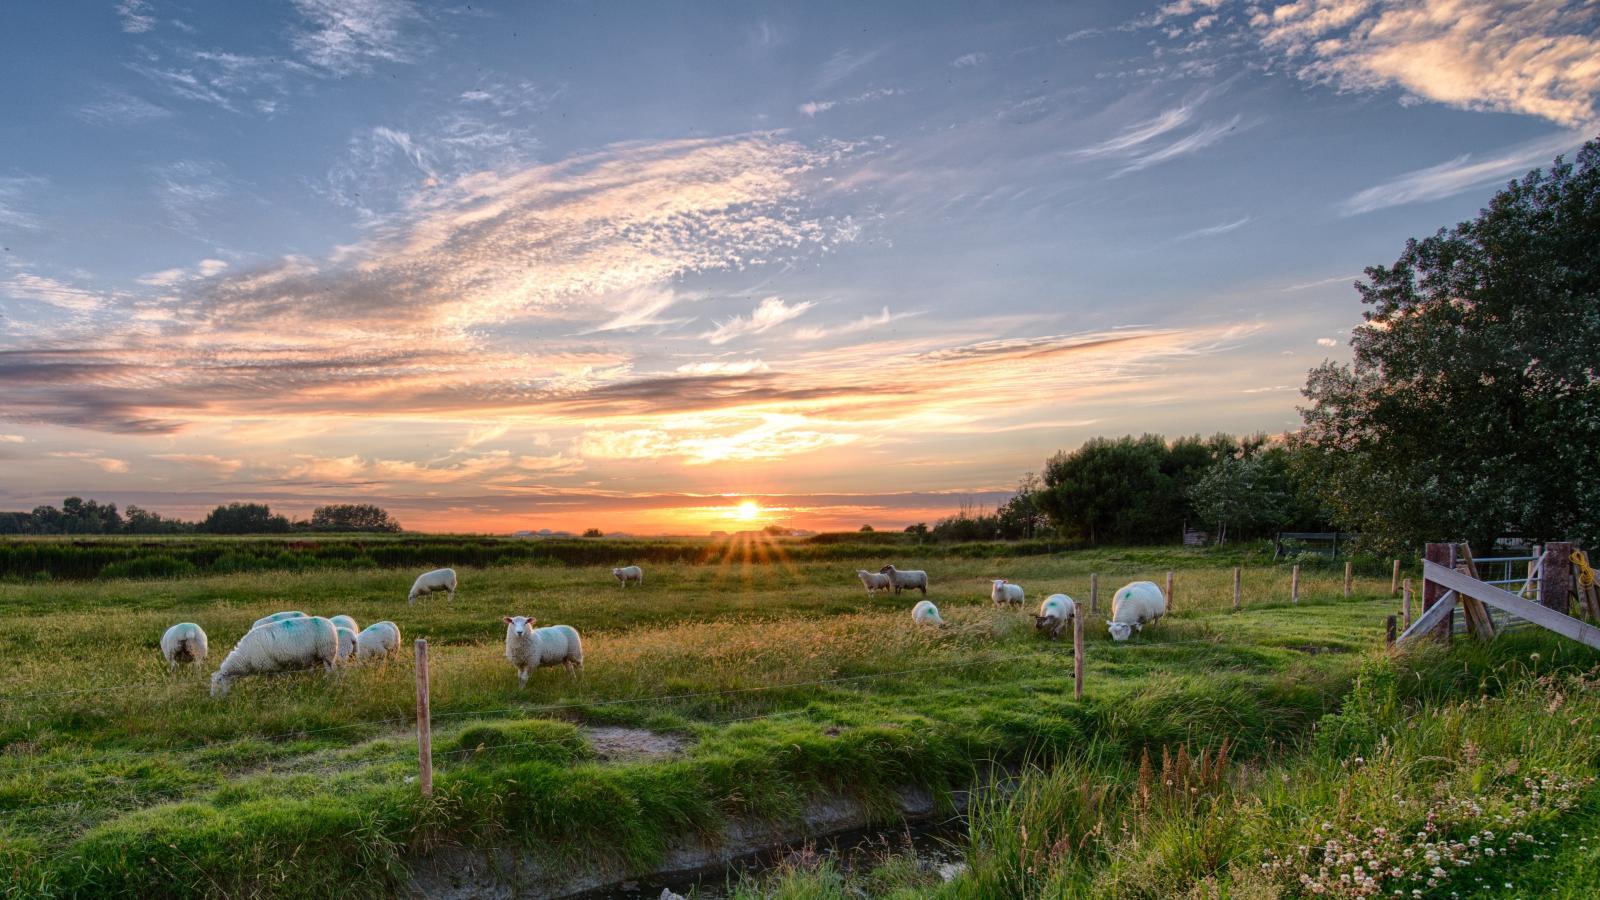 Sheep on grassland. Photo credit: Pexels